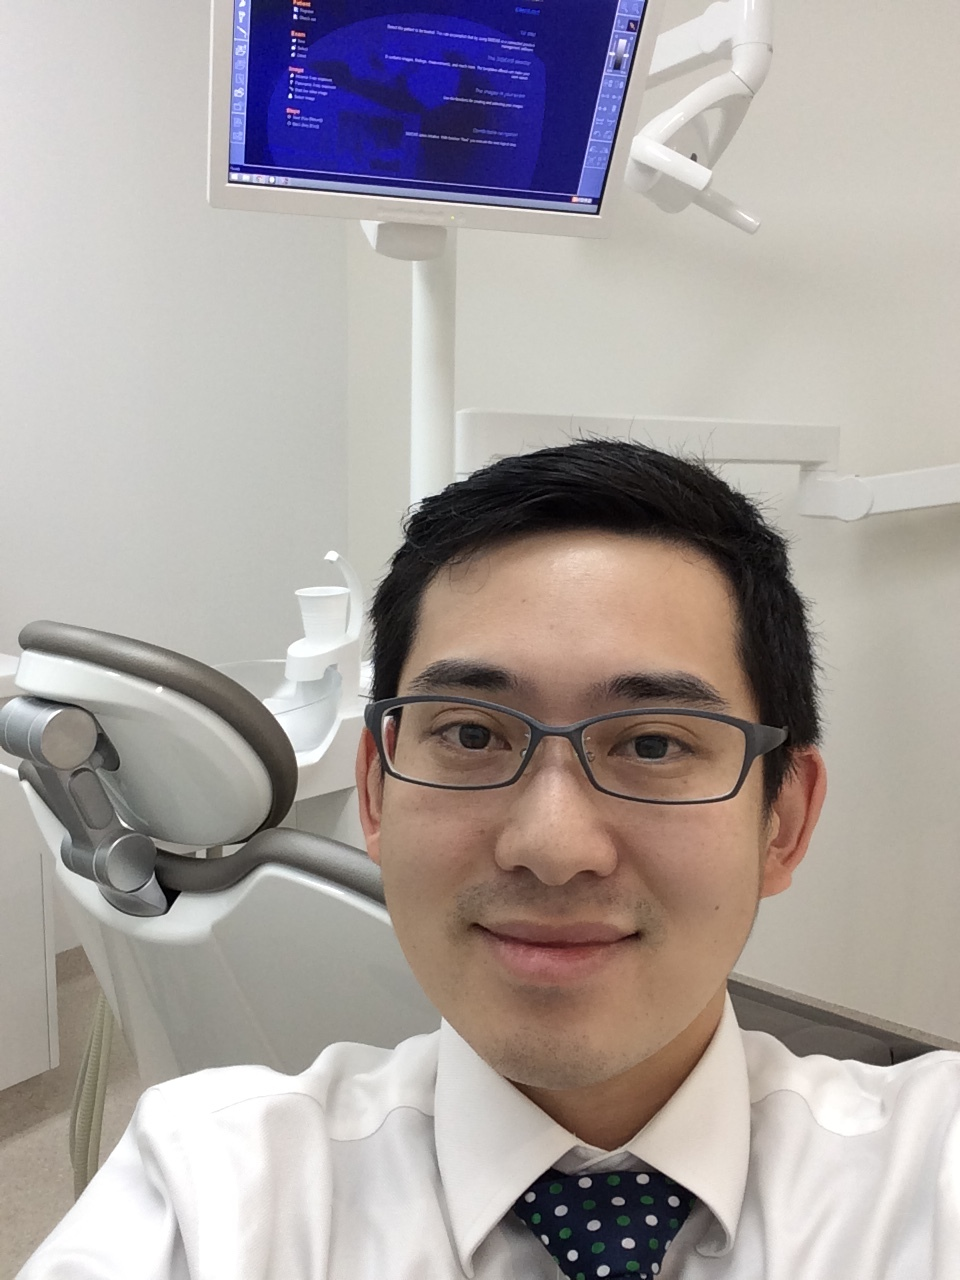 Asian dentist selfie Quincy Cheuk